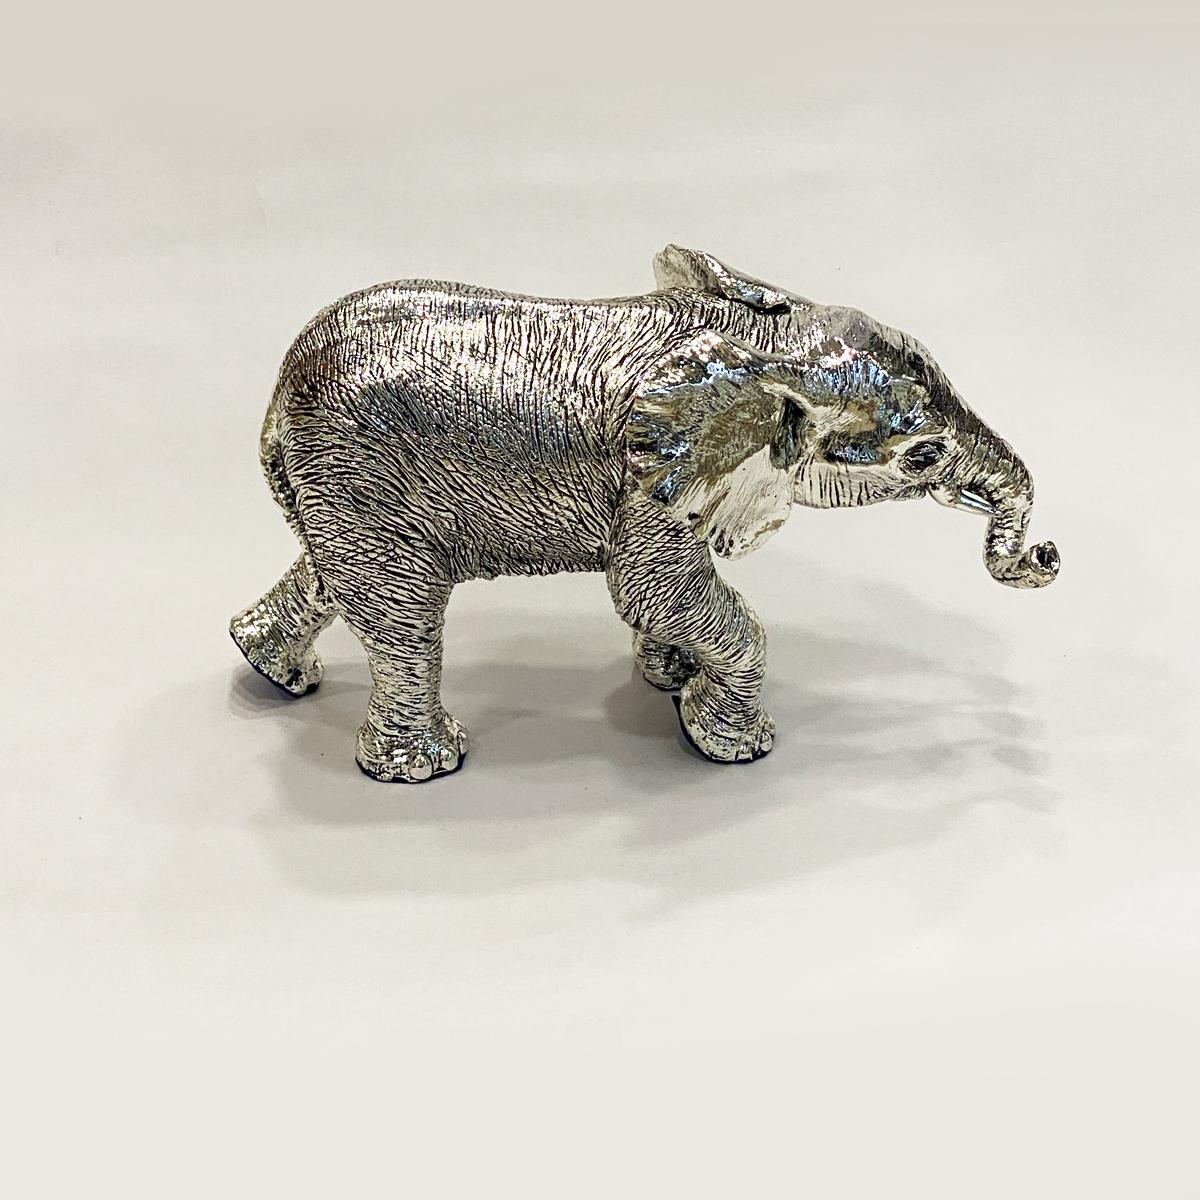 Exquisite Artistic Silver Elephant Statue   8.0″ long